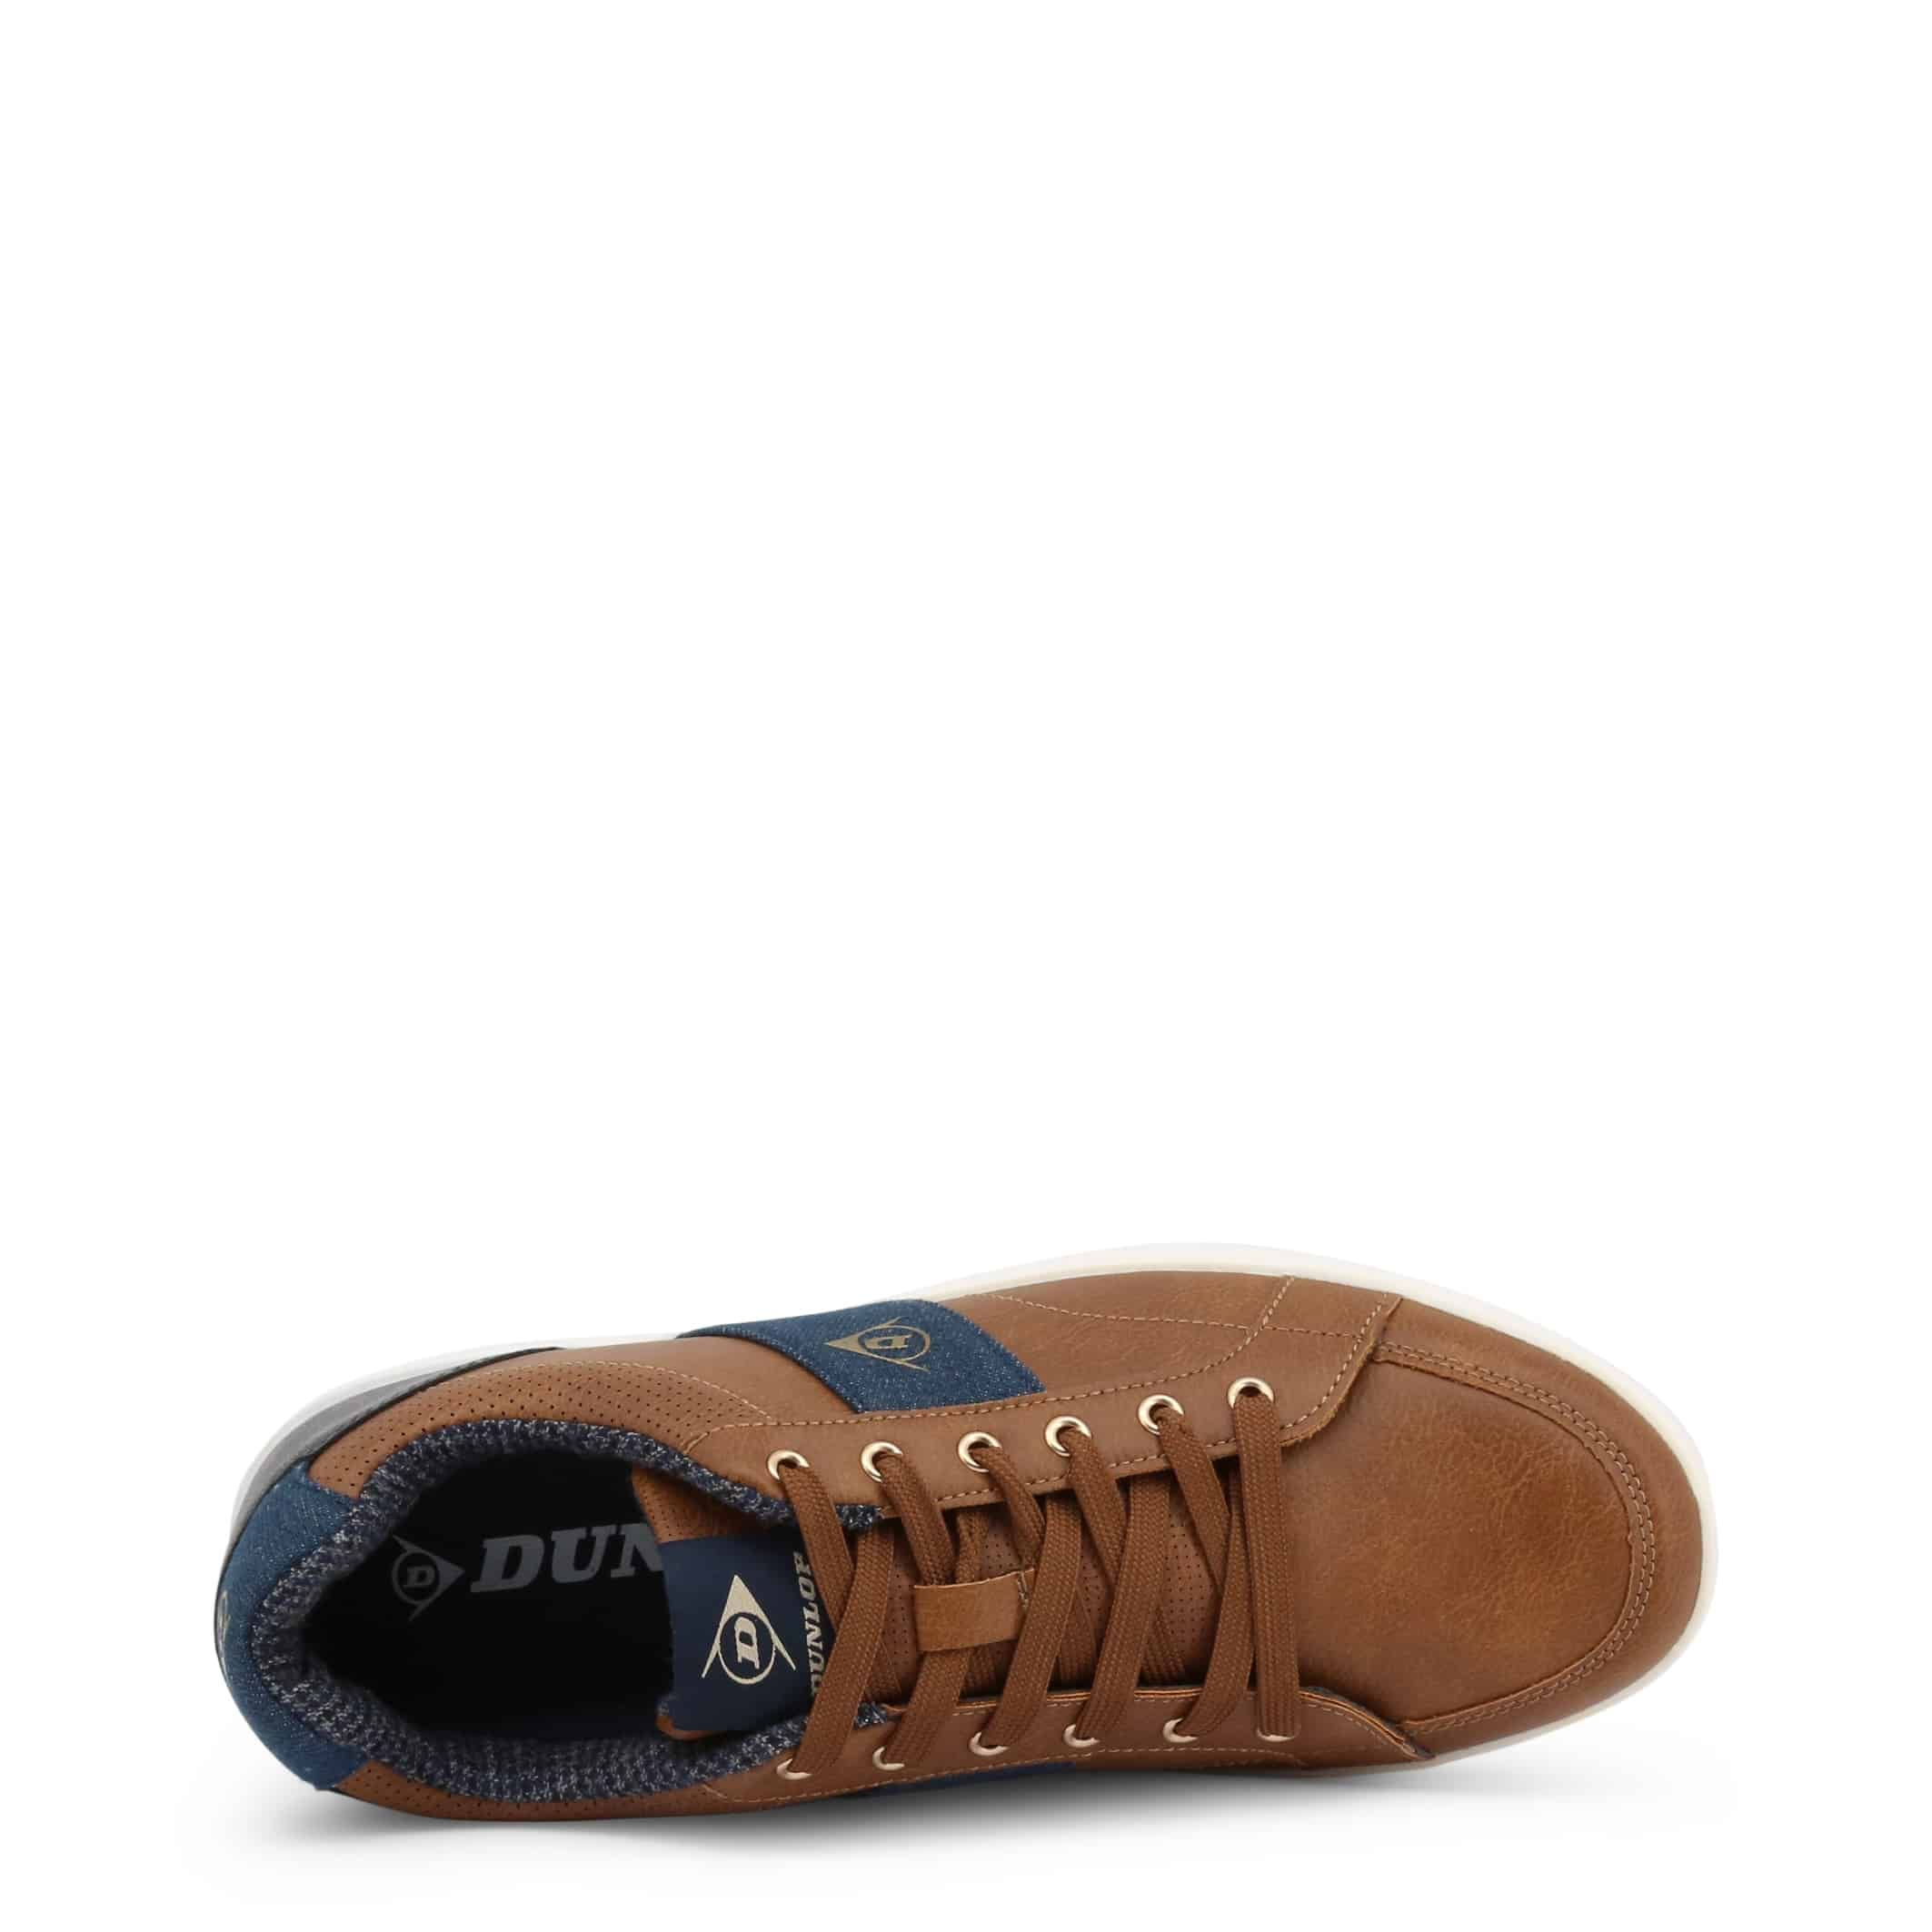 Dunlop - 35633 | You Fashion Outlet